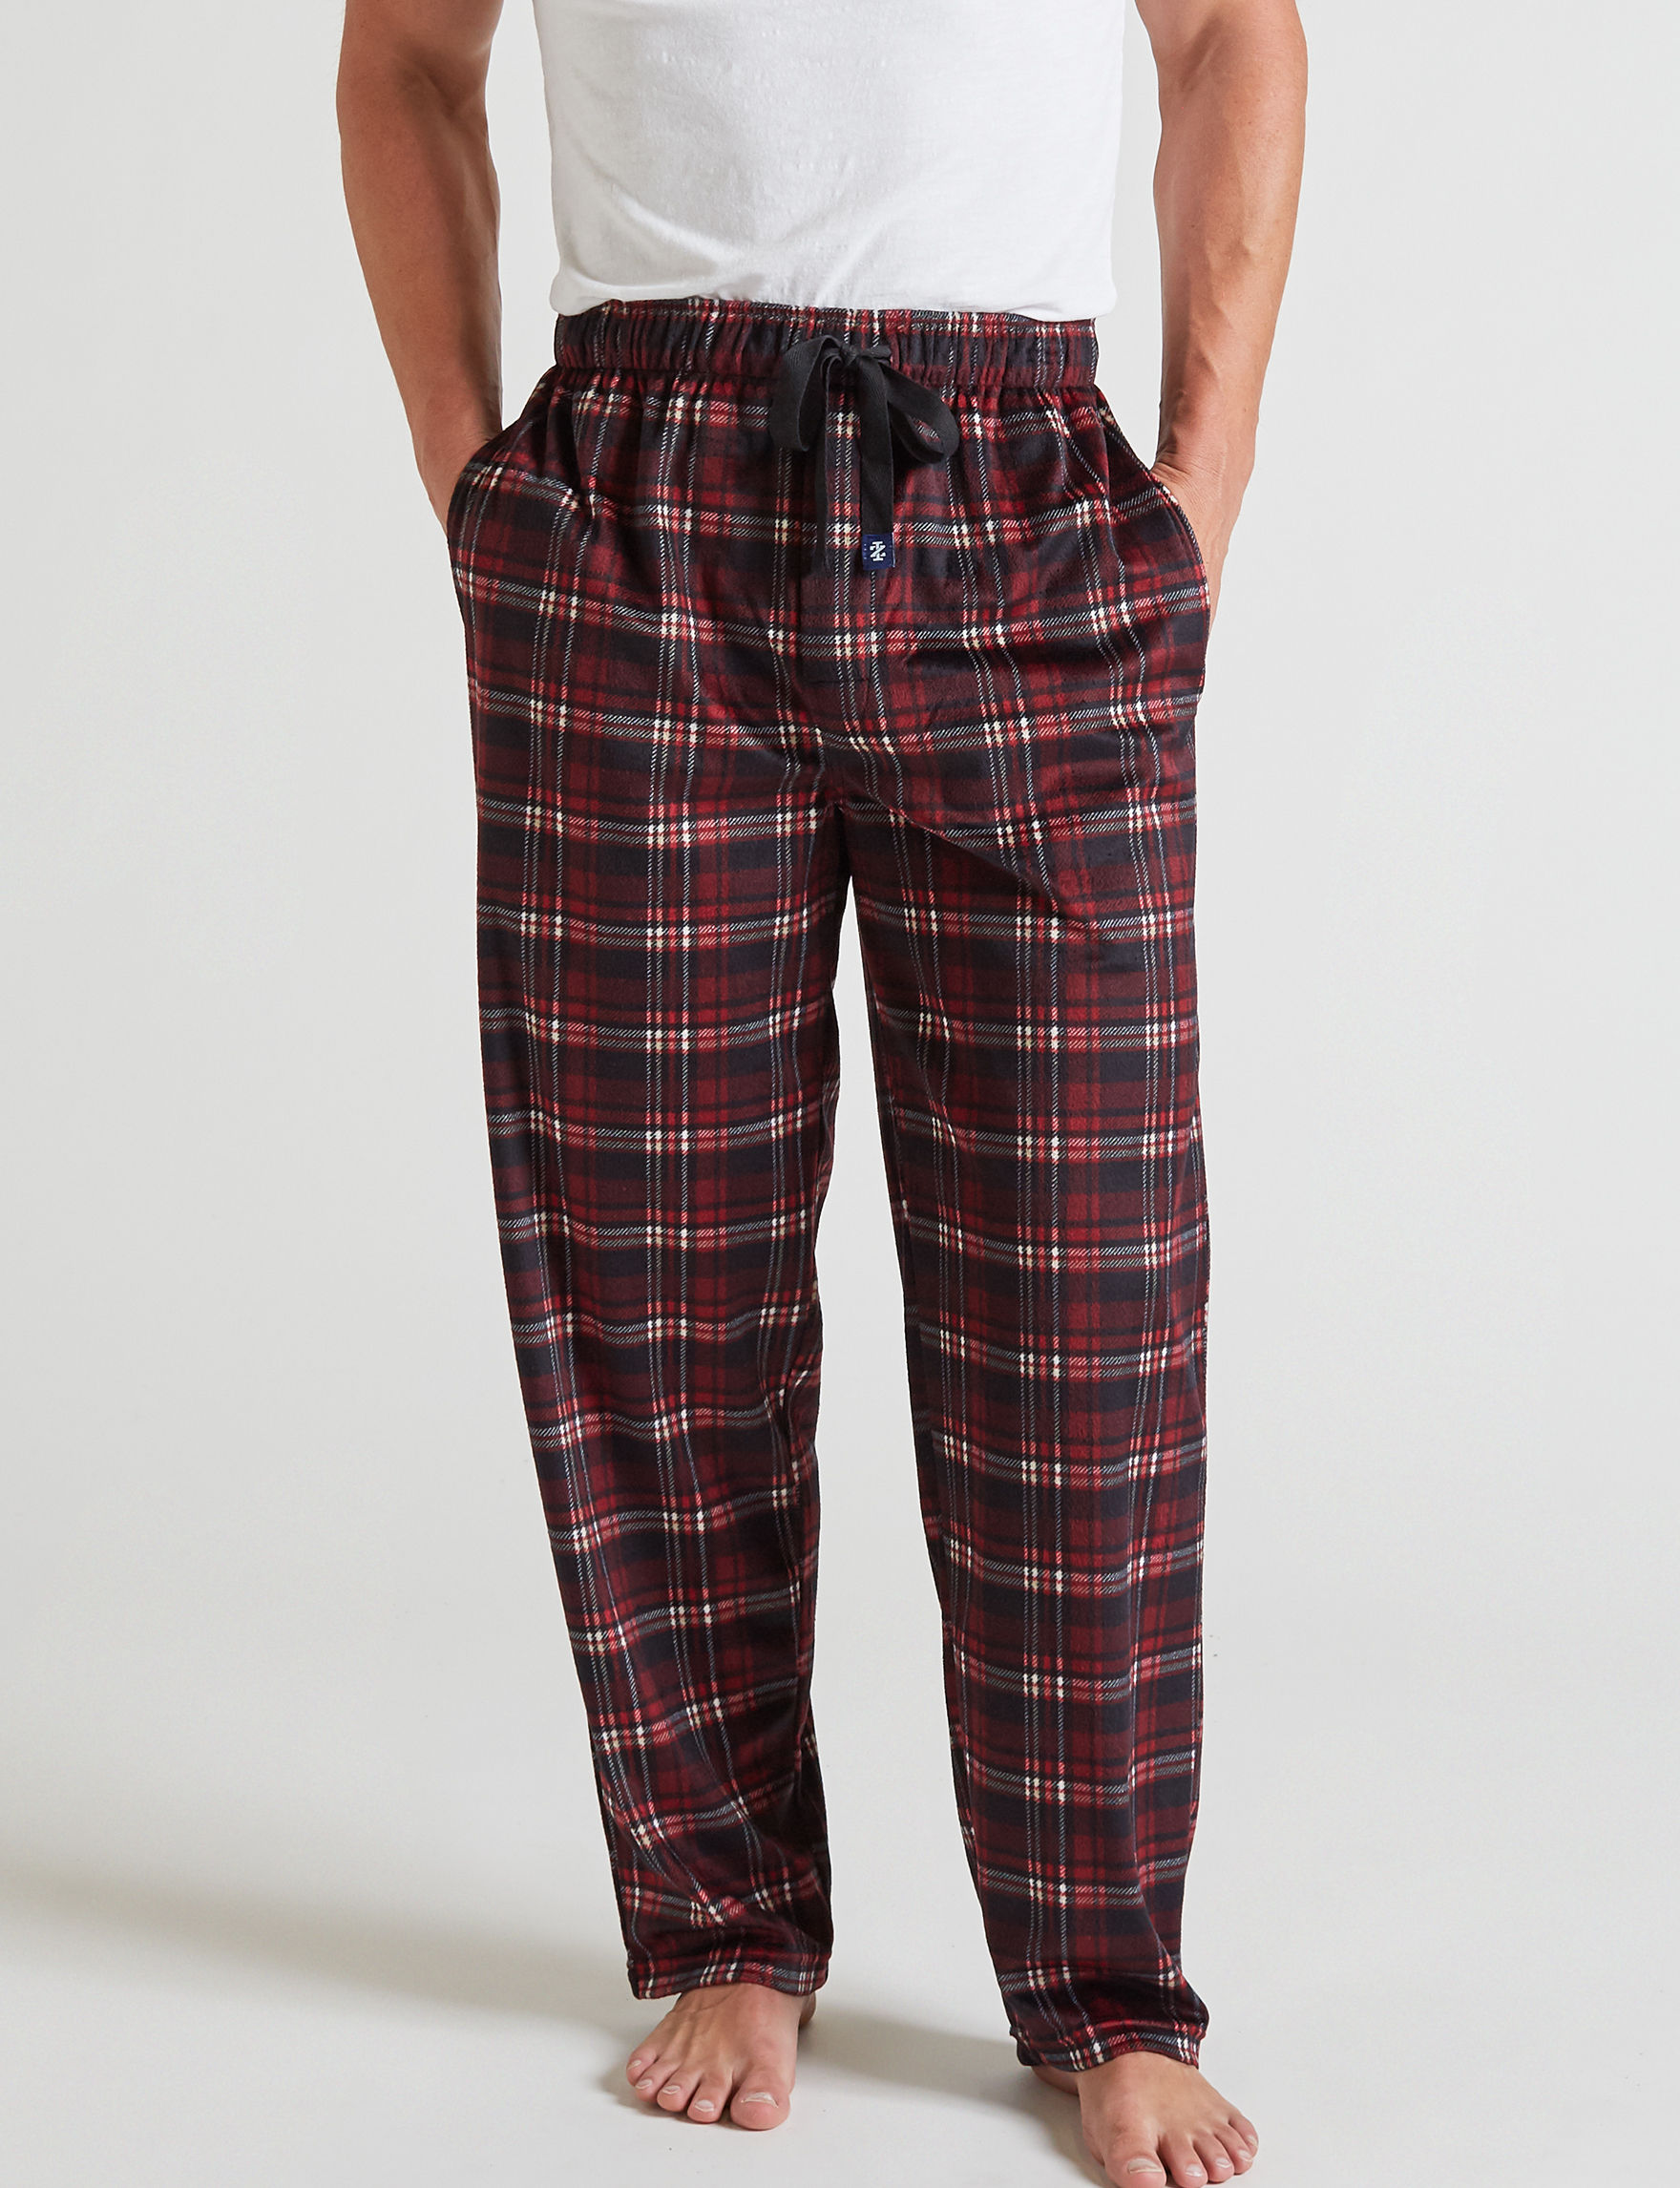 Izod Black Plaid Pajama Bottoms